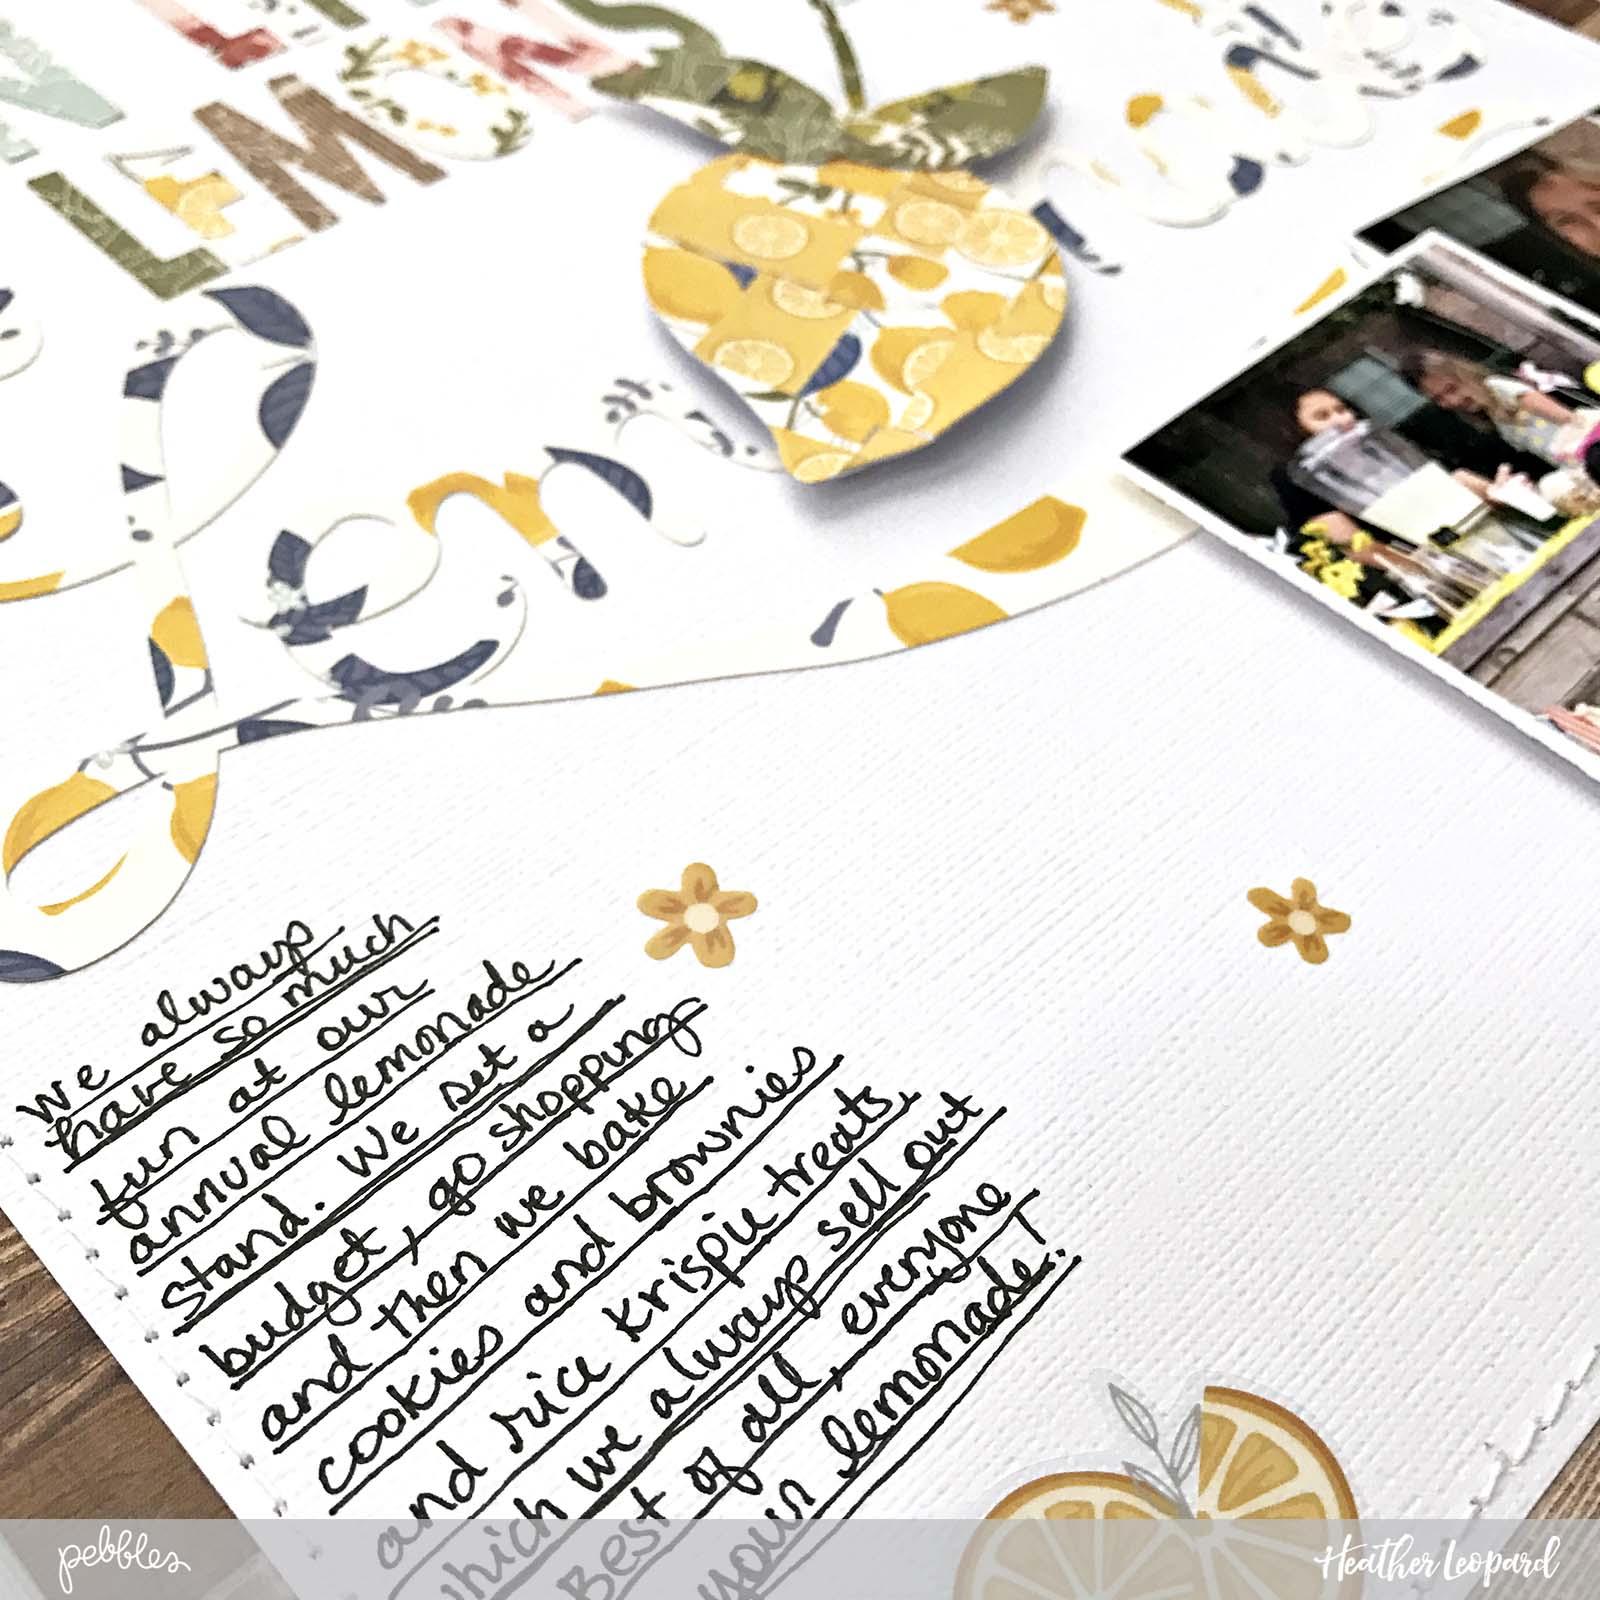 Make Lemonade Scrapbooking Layout by @heatherleopard using the @PebblesInc #jenhadfield #thesimplelife collection #scrapbooking #layout #lemonade #lemonadestand #madewithpebbles